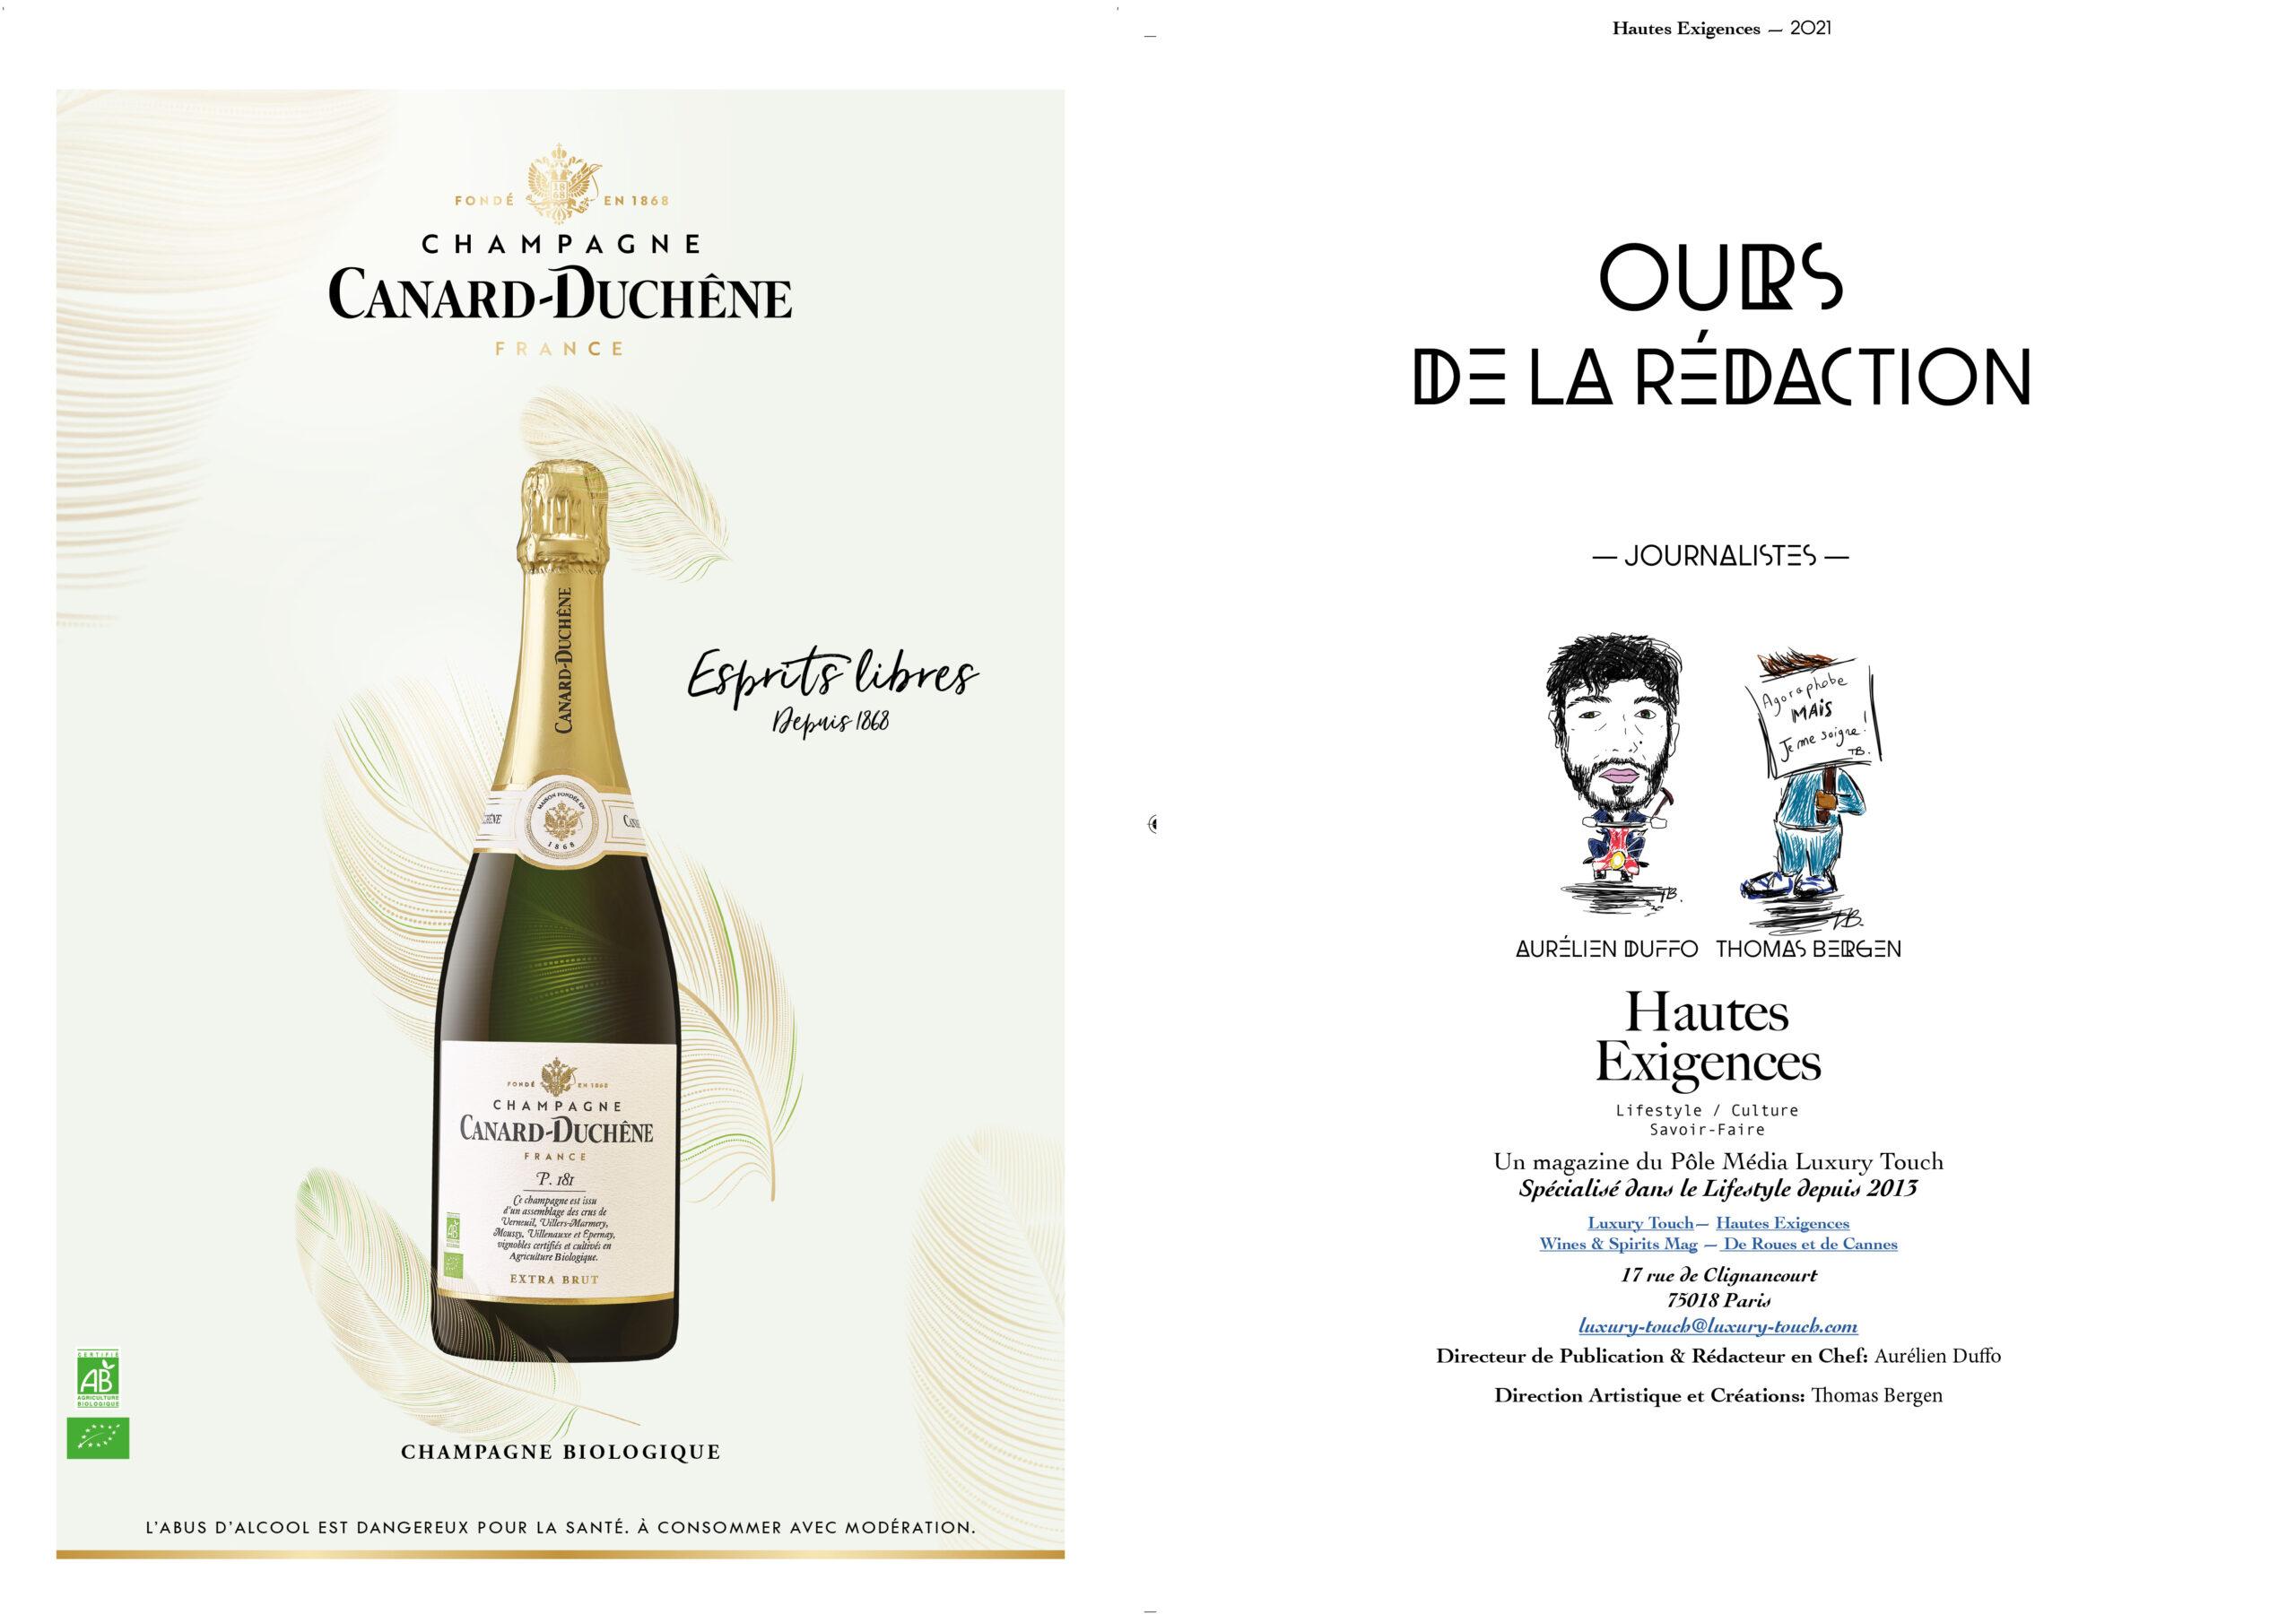 Hautes Exigences Magazine Hors Serie 2021 page 4-5